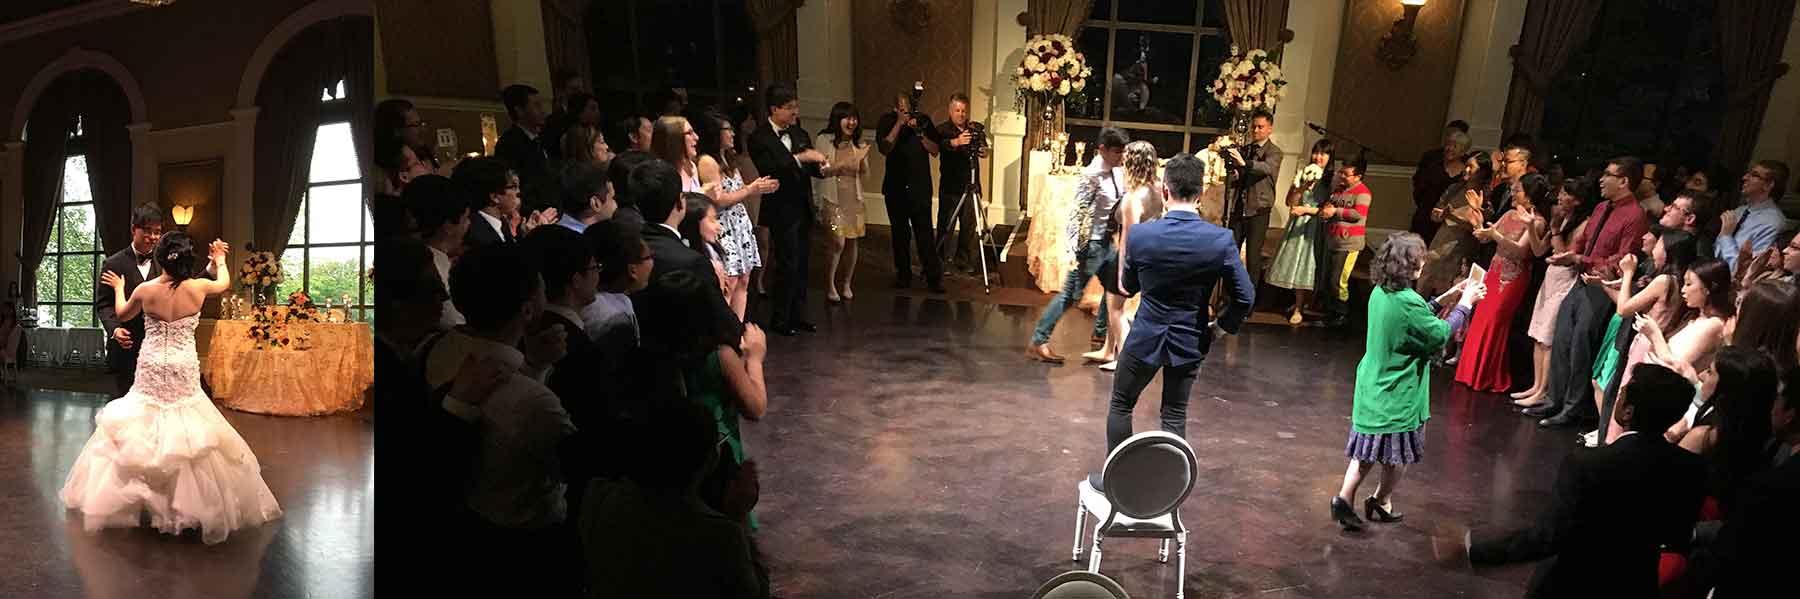 Wedding-DJ-in-Liberty-Grand-Toronto